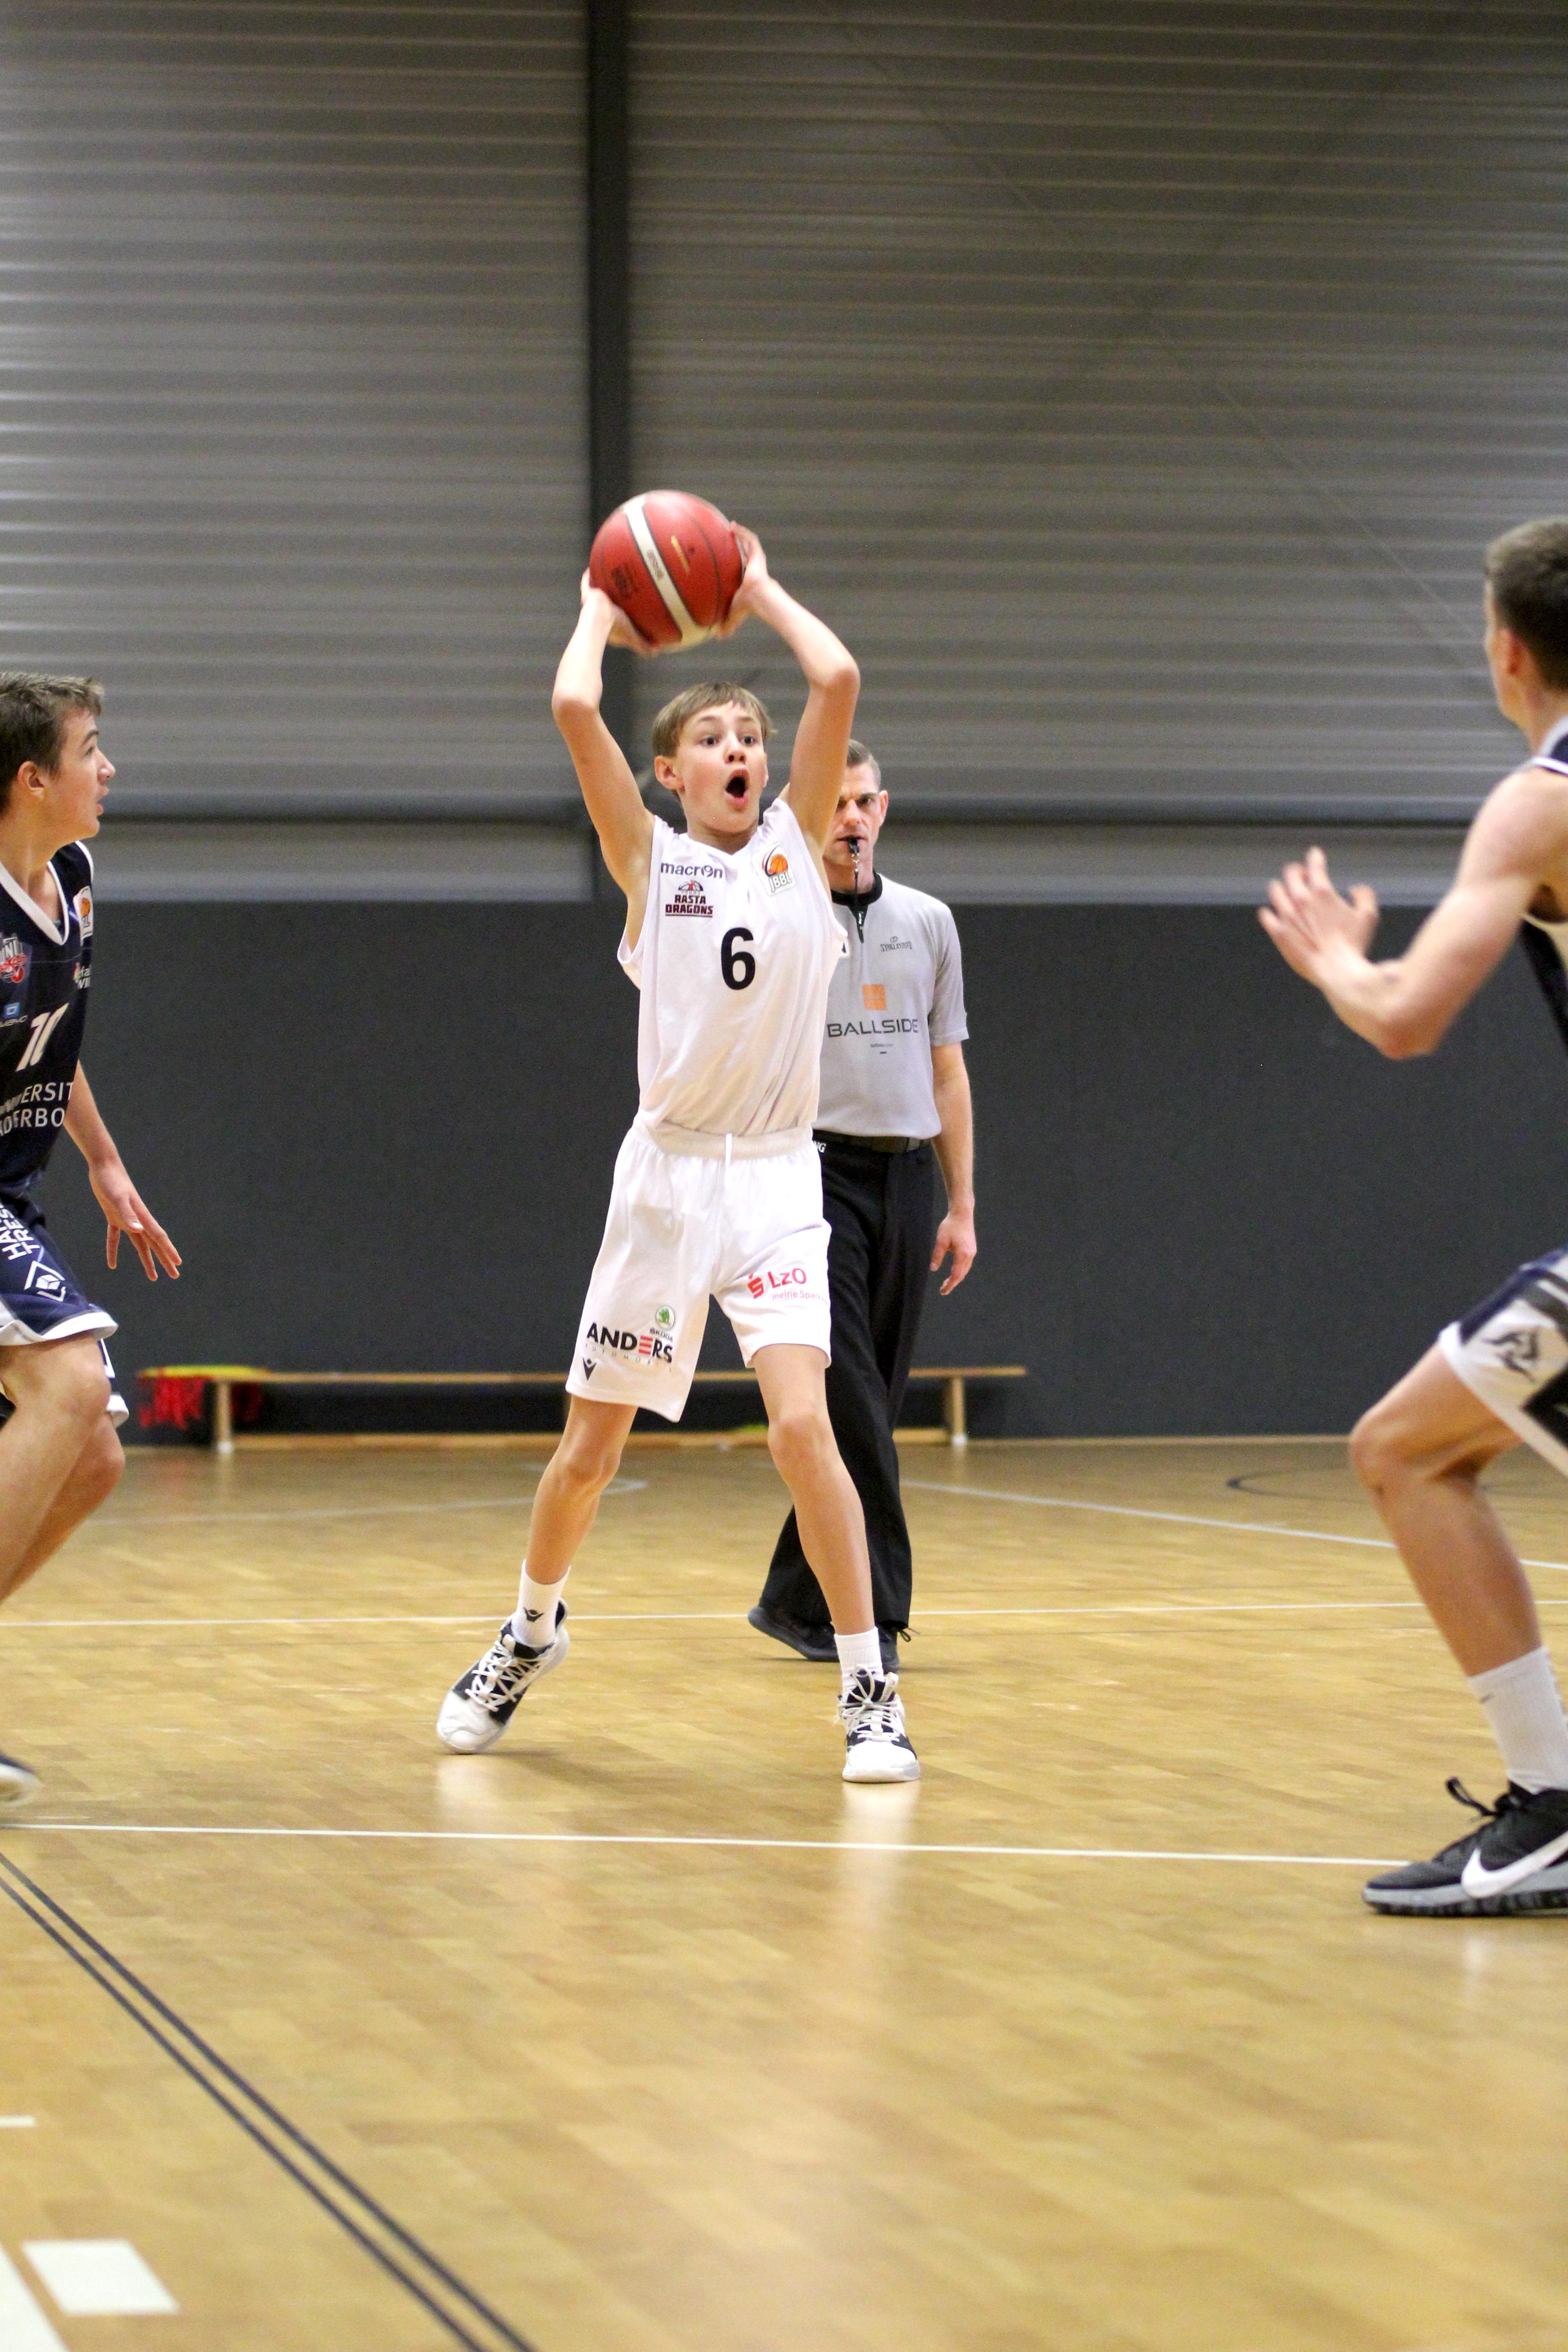 1_JBBL_20-21_YOUNG-RASTA-DRAGONS_Paderborn_Spieltag2_Johannes-Hellmann3